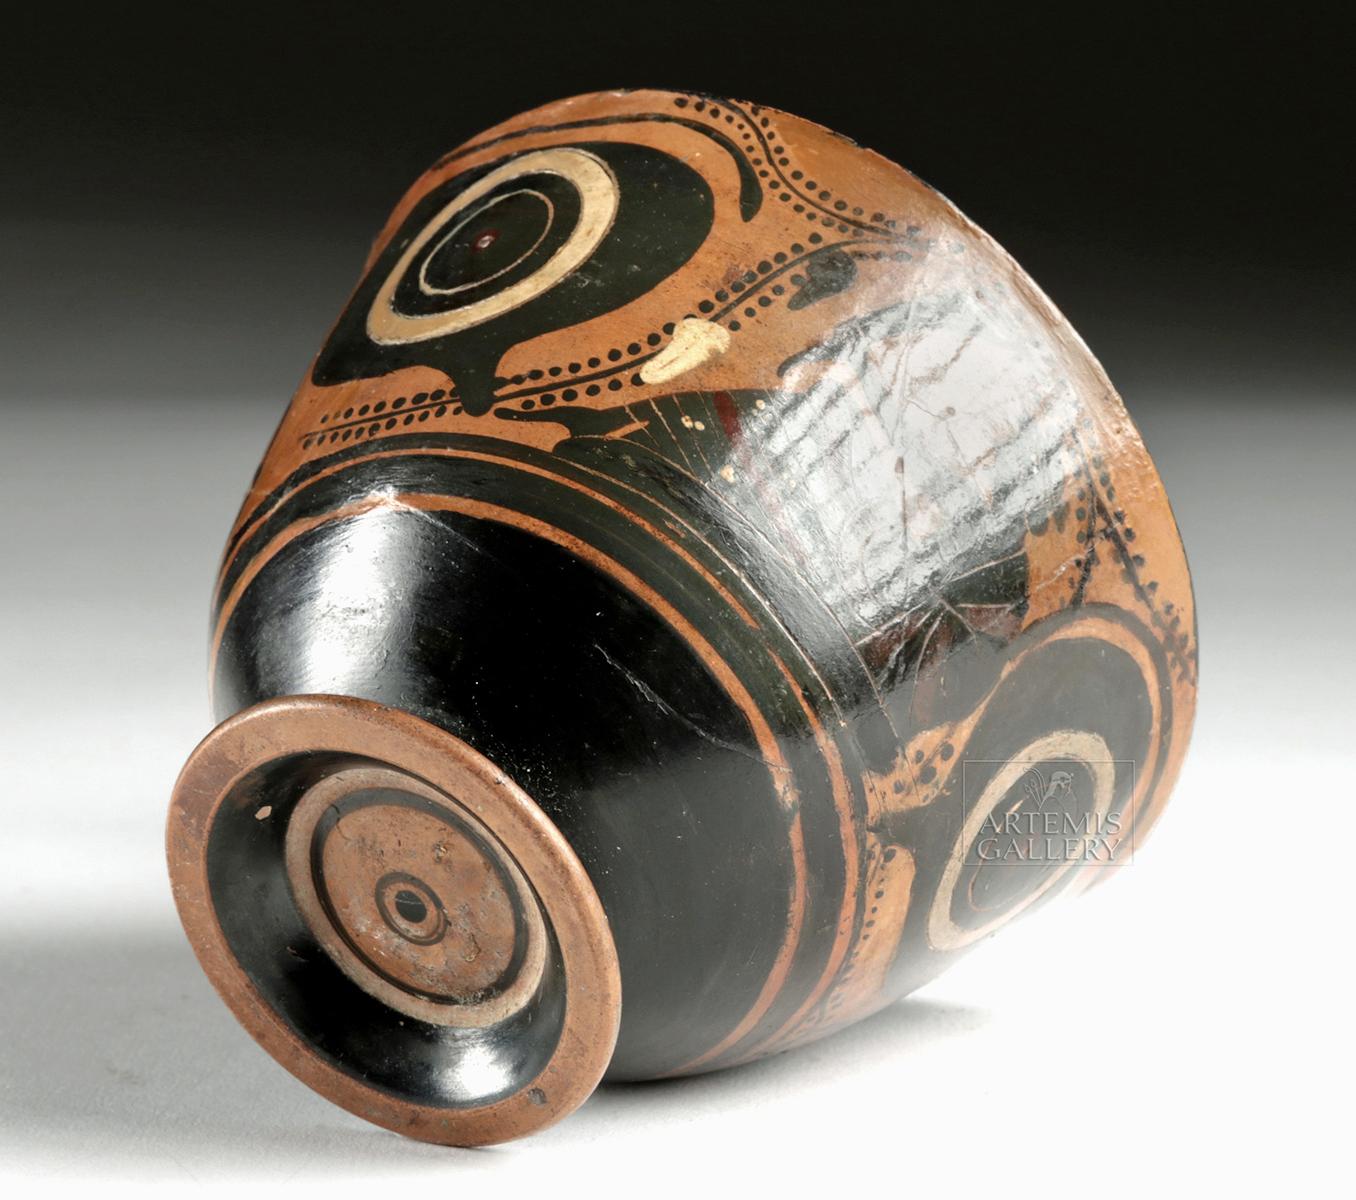 Lot 25a - Attic Black-Figure Kyathos - Eyes, Dionysos, Sphinxes